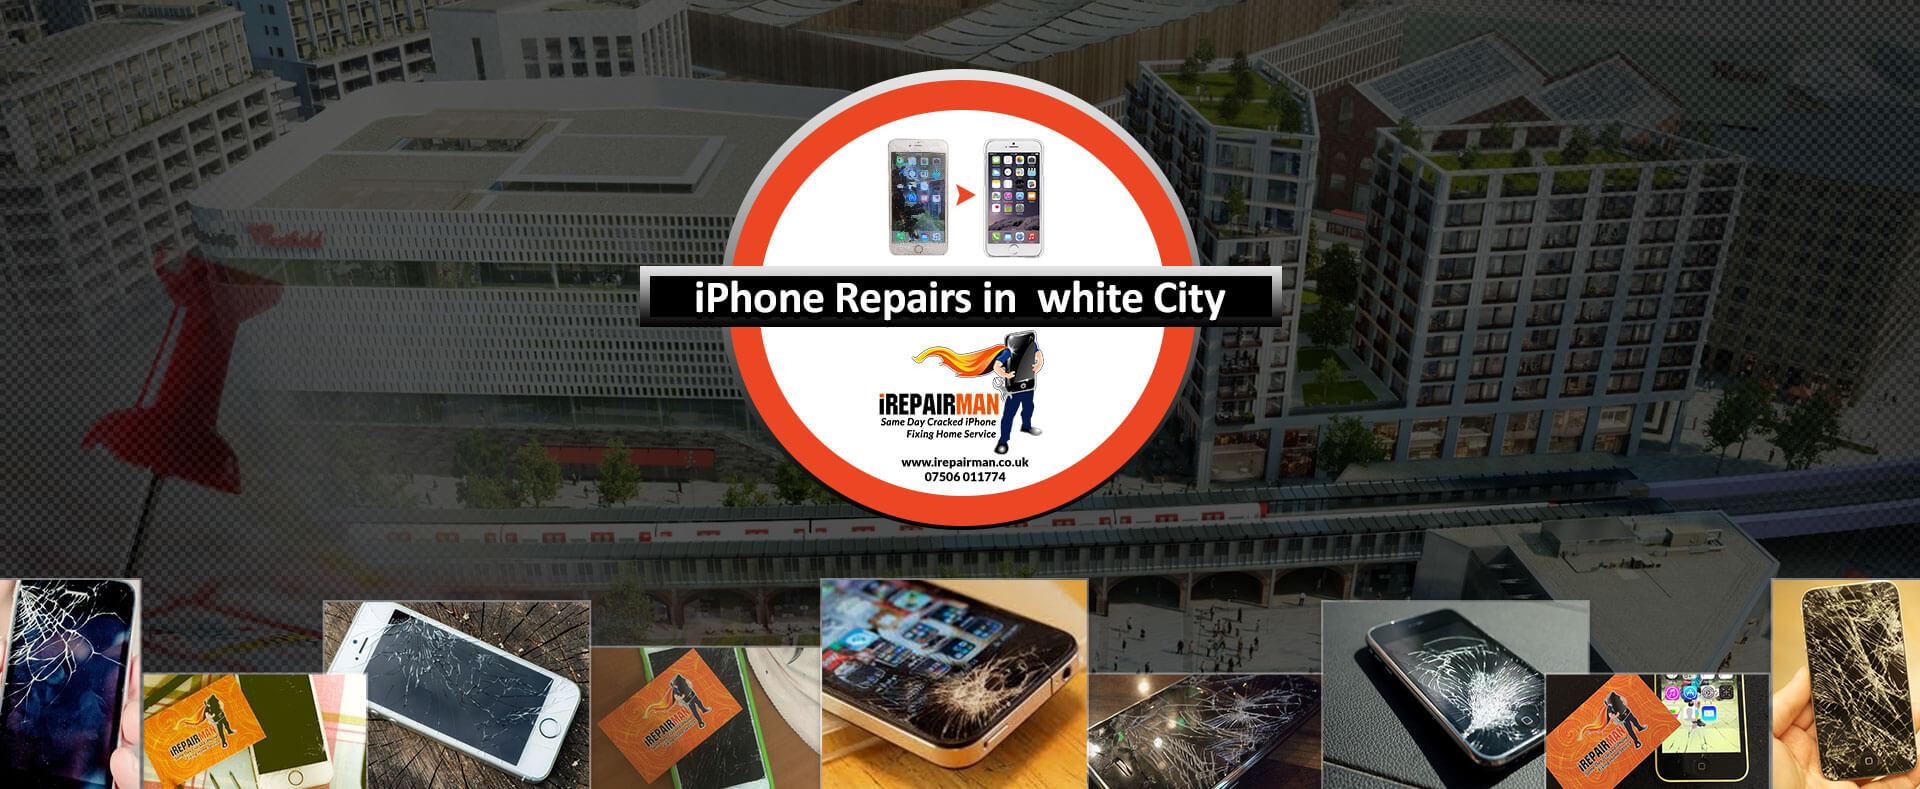 iphone-repairs-in-white-city